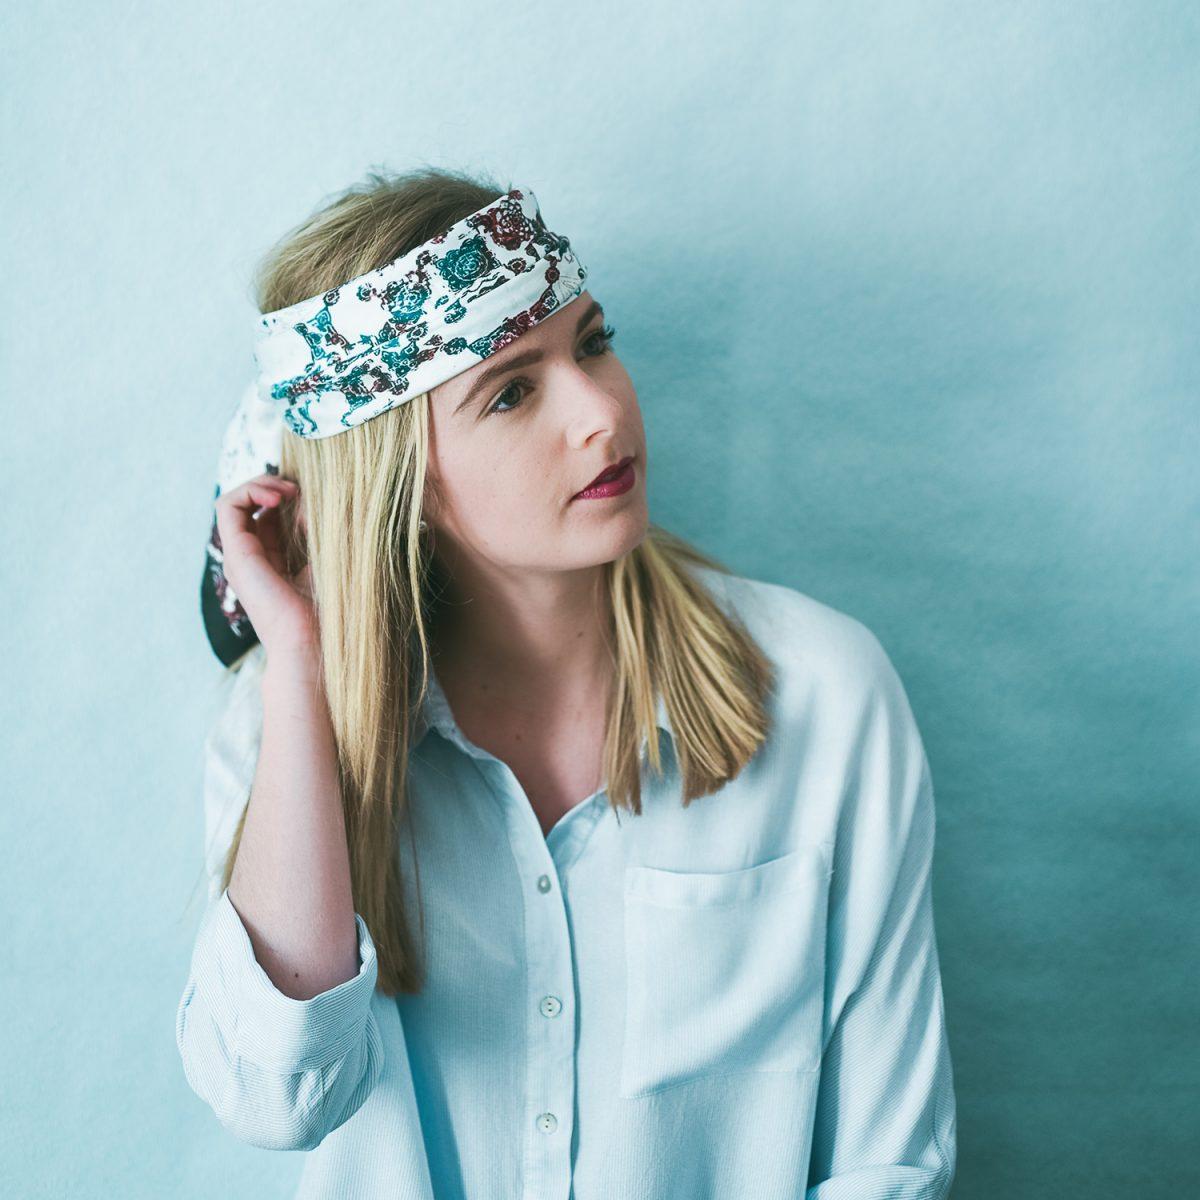 Âmulet Foulard ATLAS Sky fashion headwrapped style